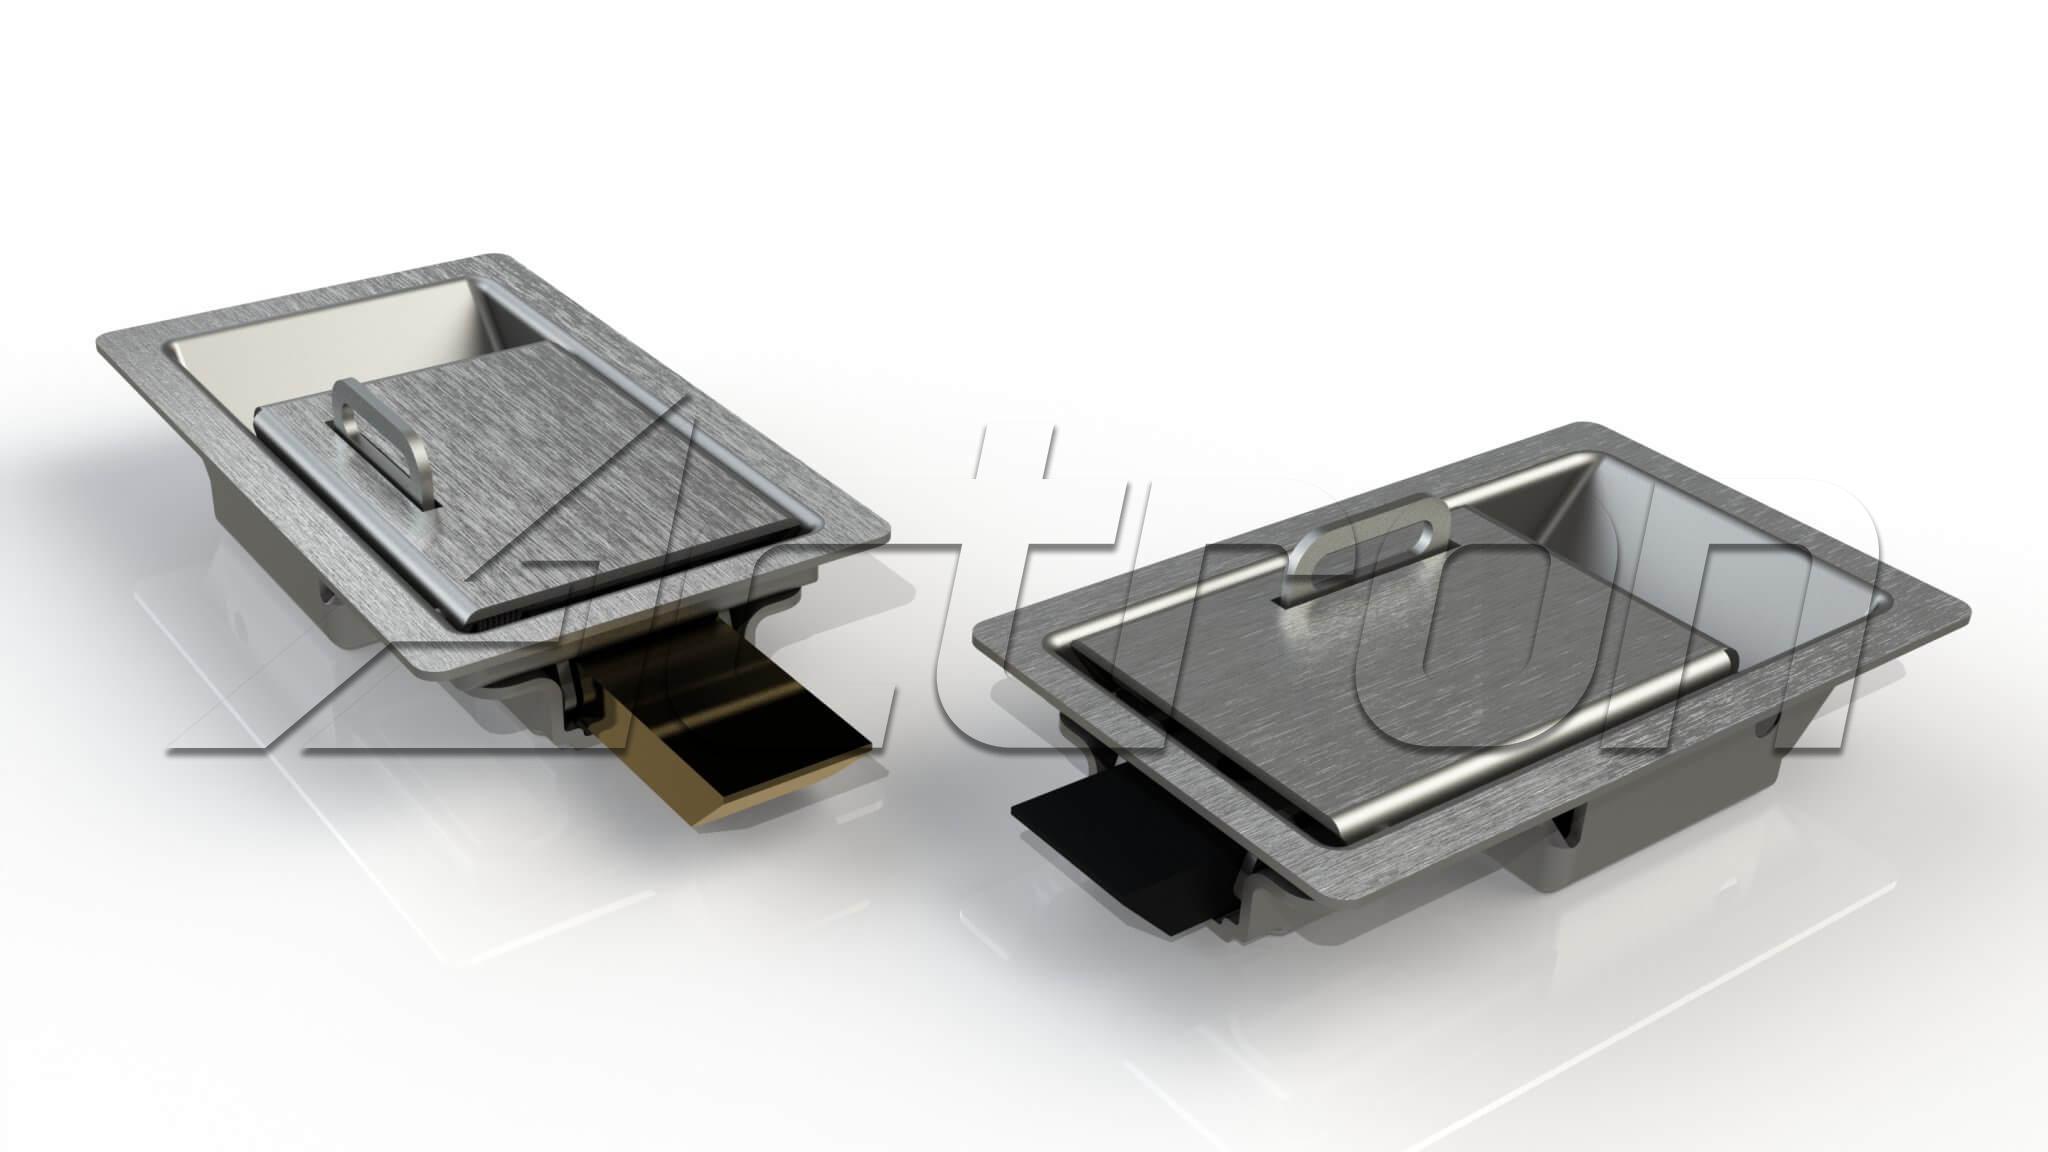 latch-assy-8211-paddle-4205-a23002.jpg